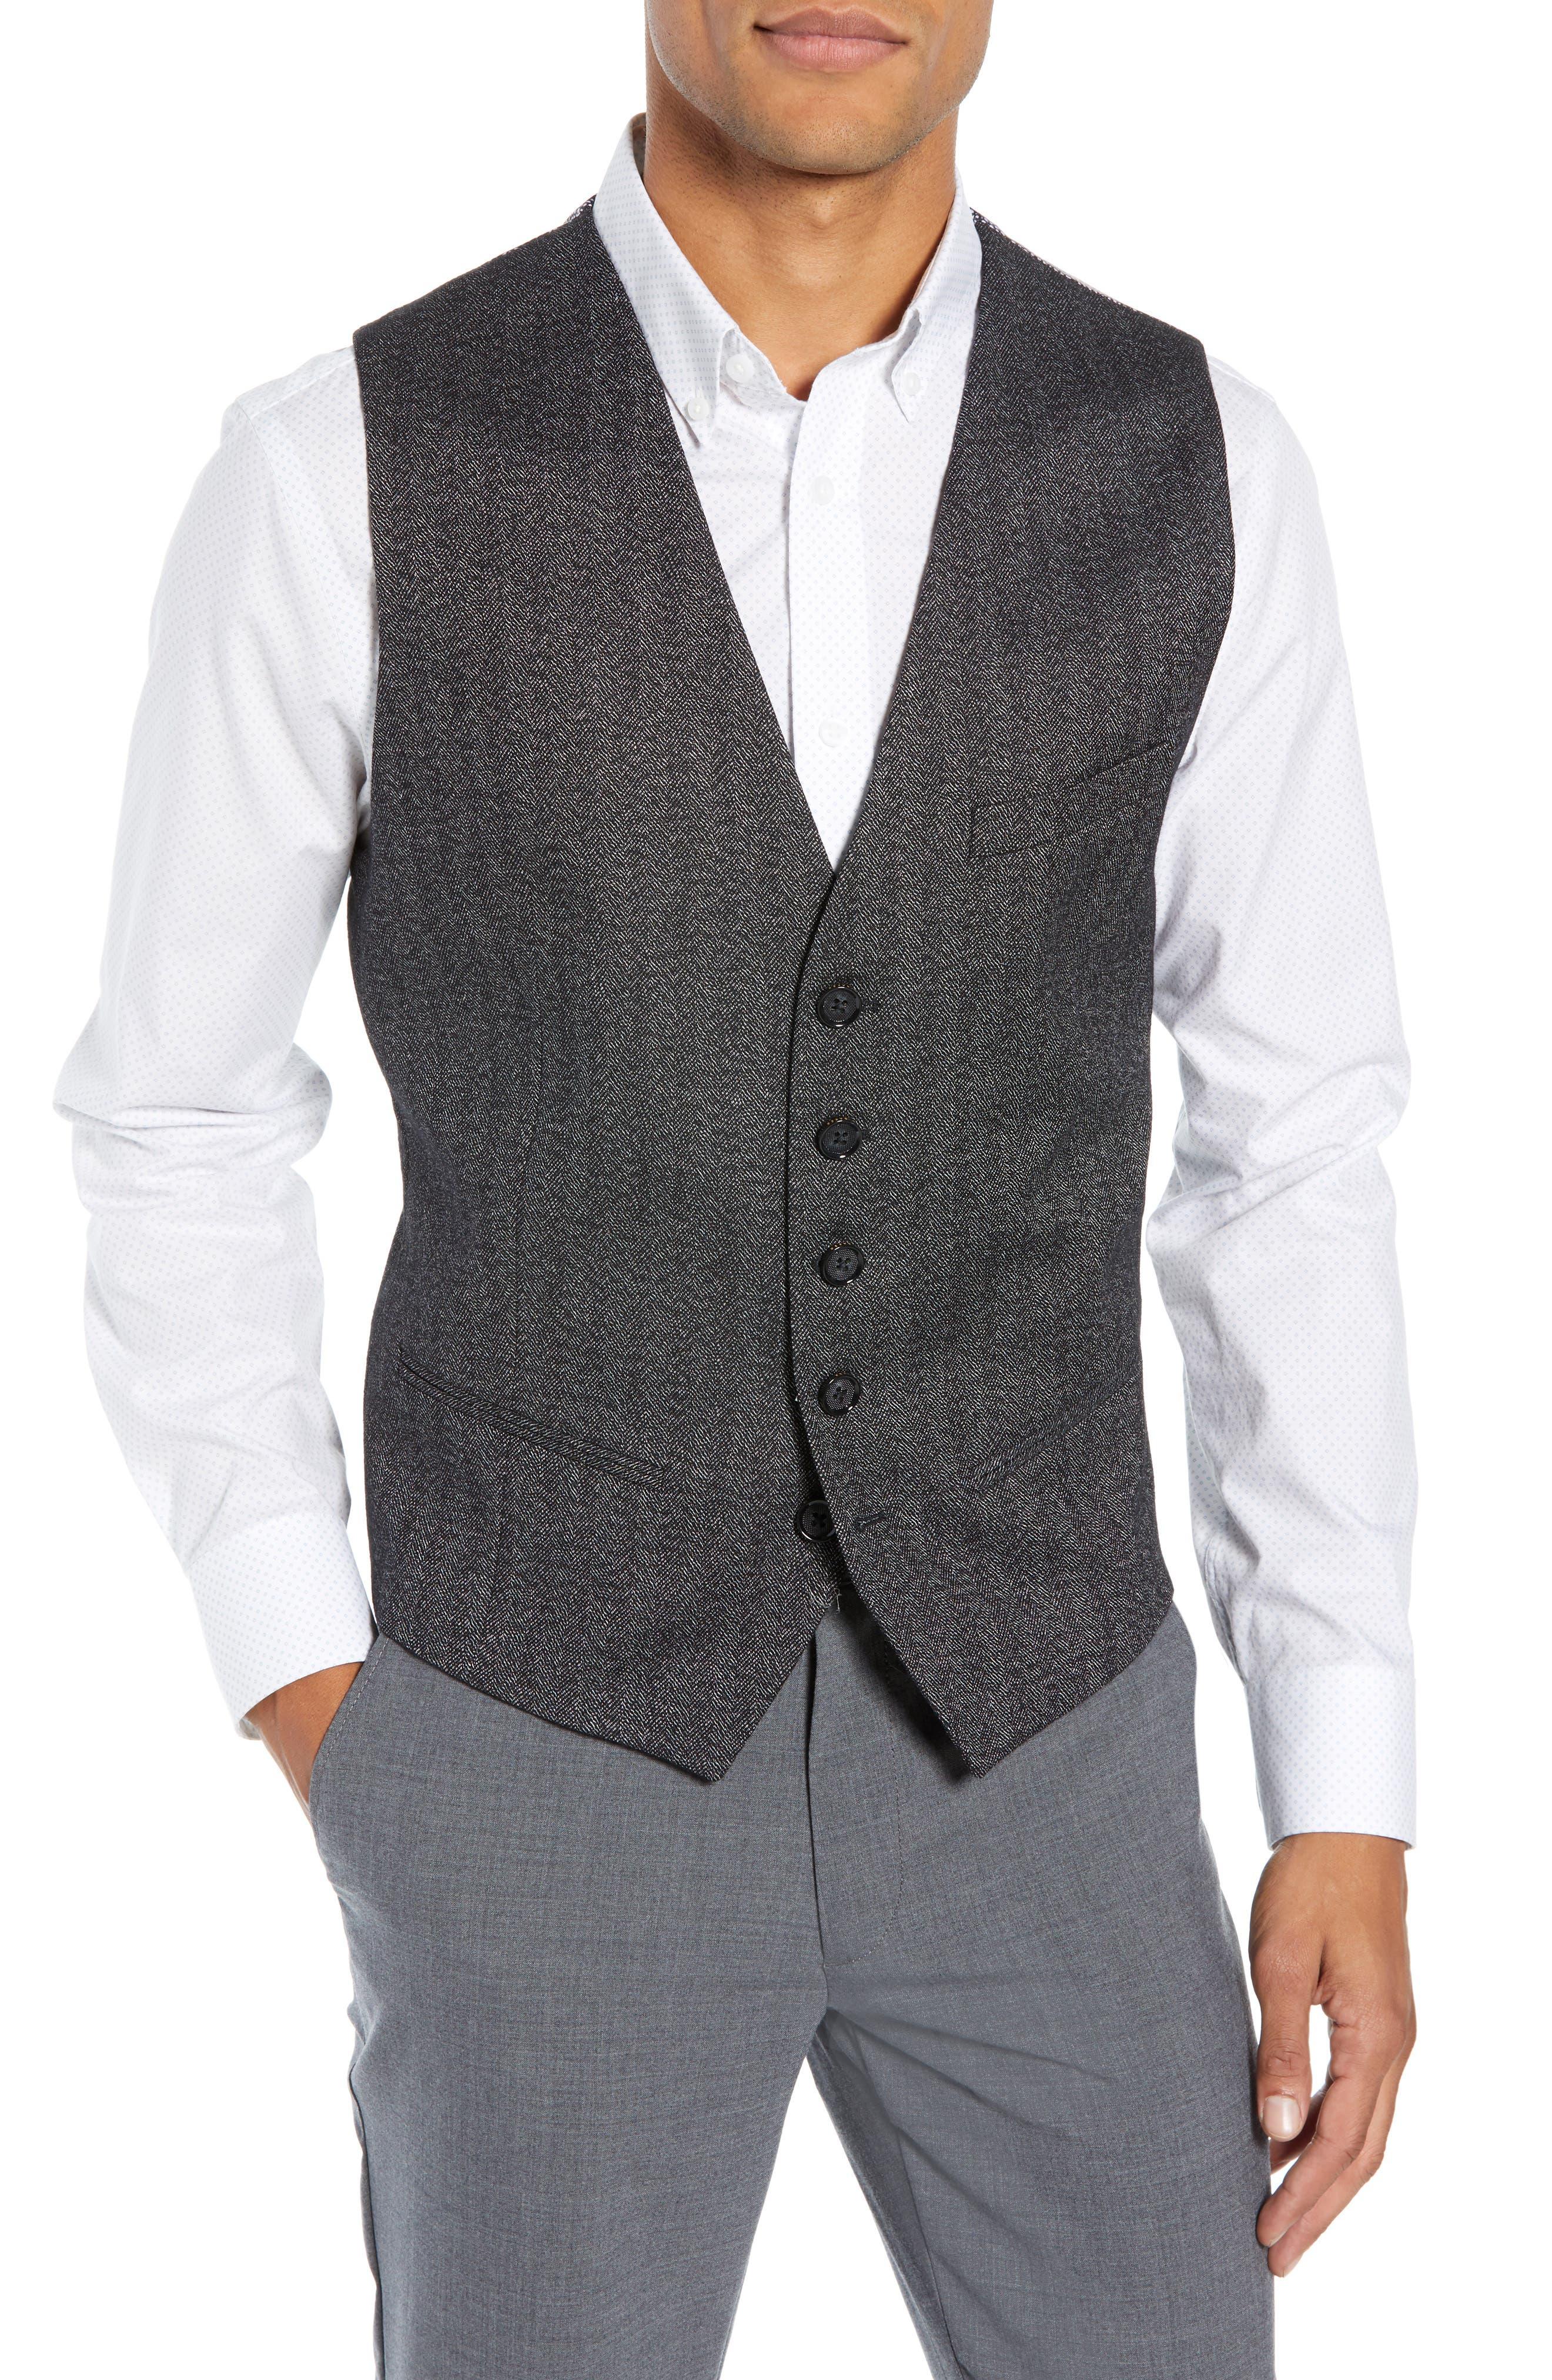 Wenswai Slim Vest,                         Main,                         color, CHARCOAL